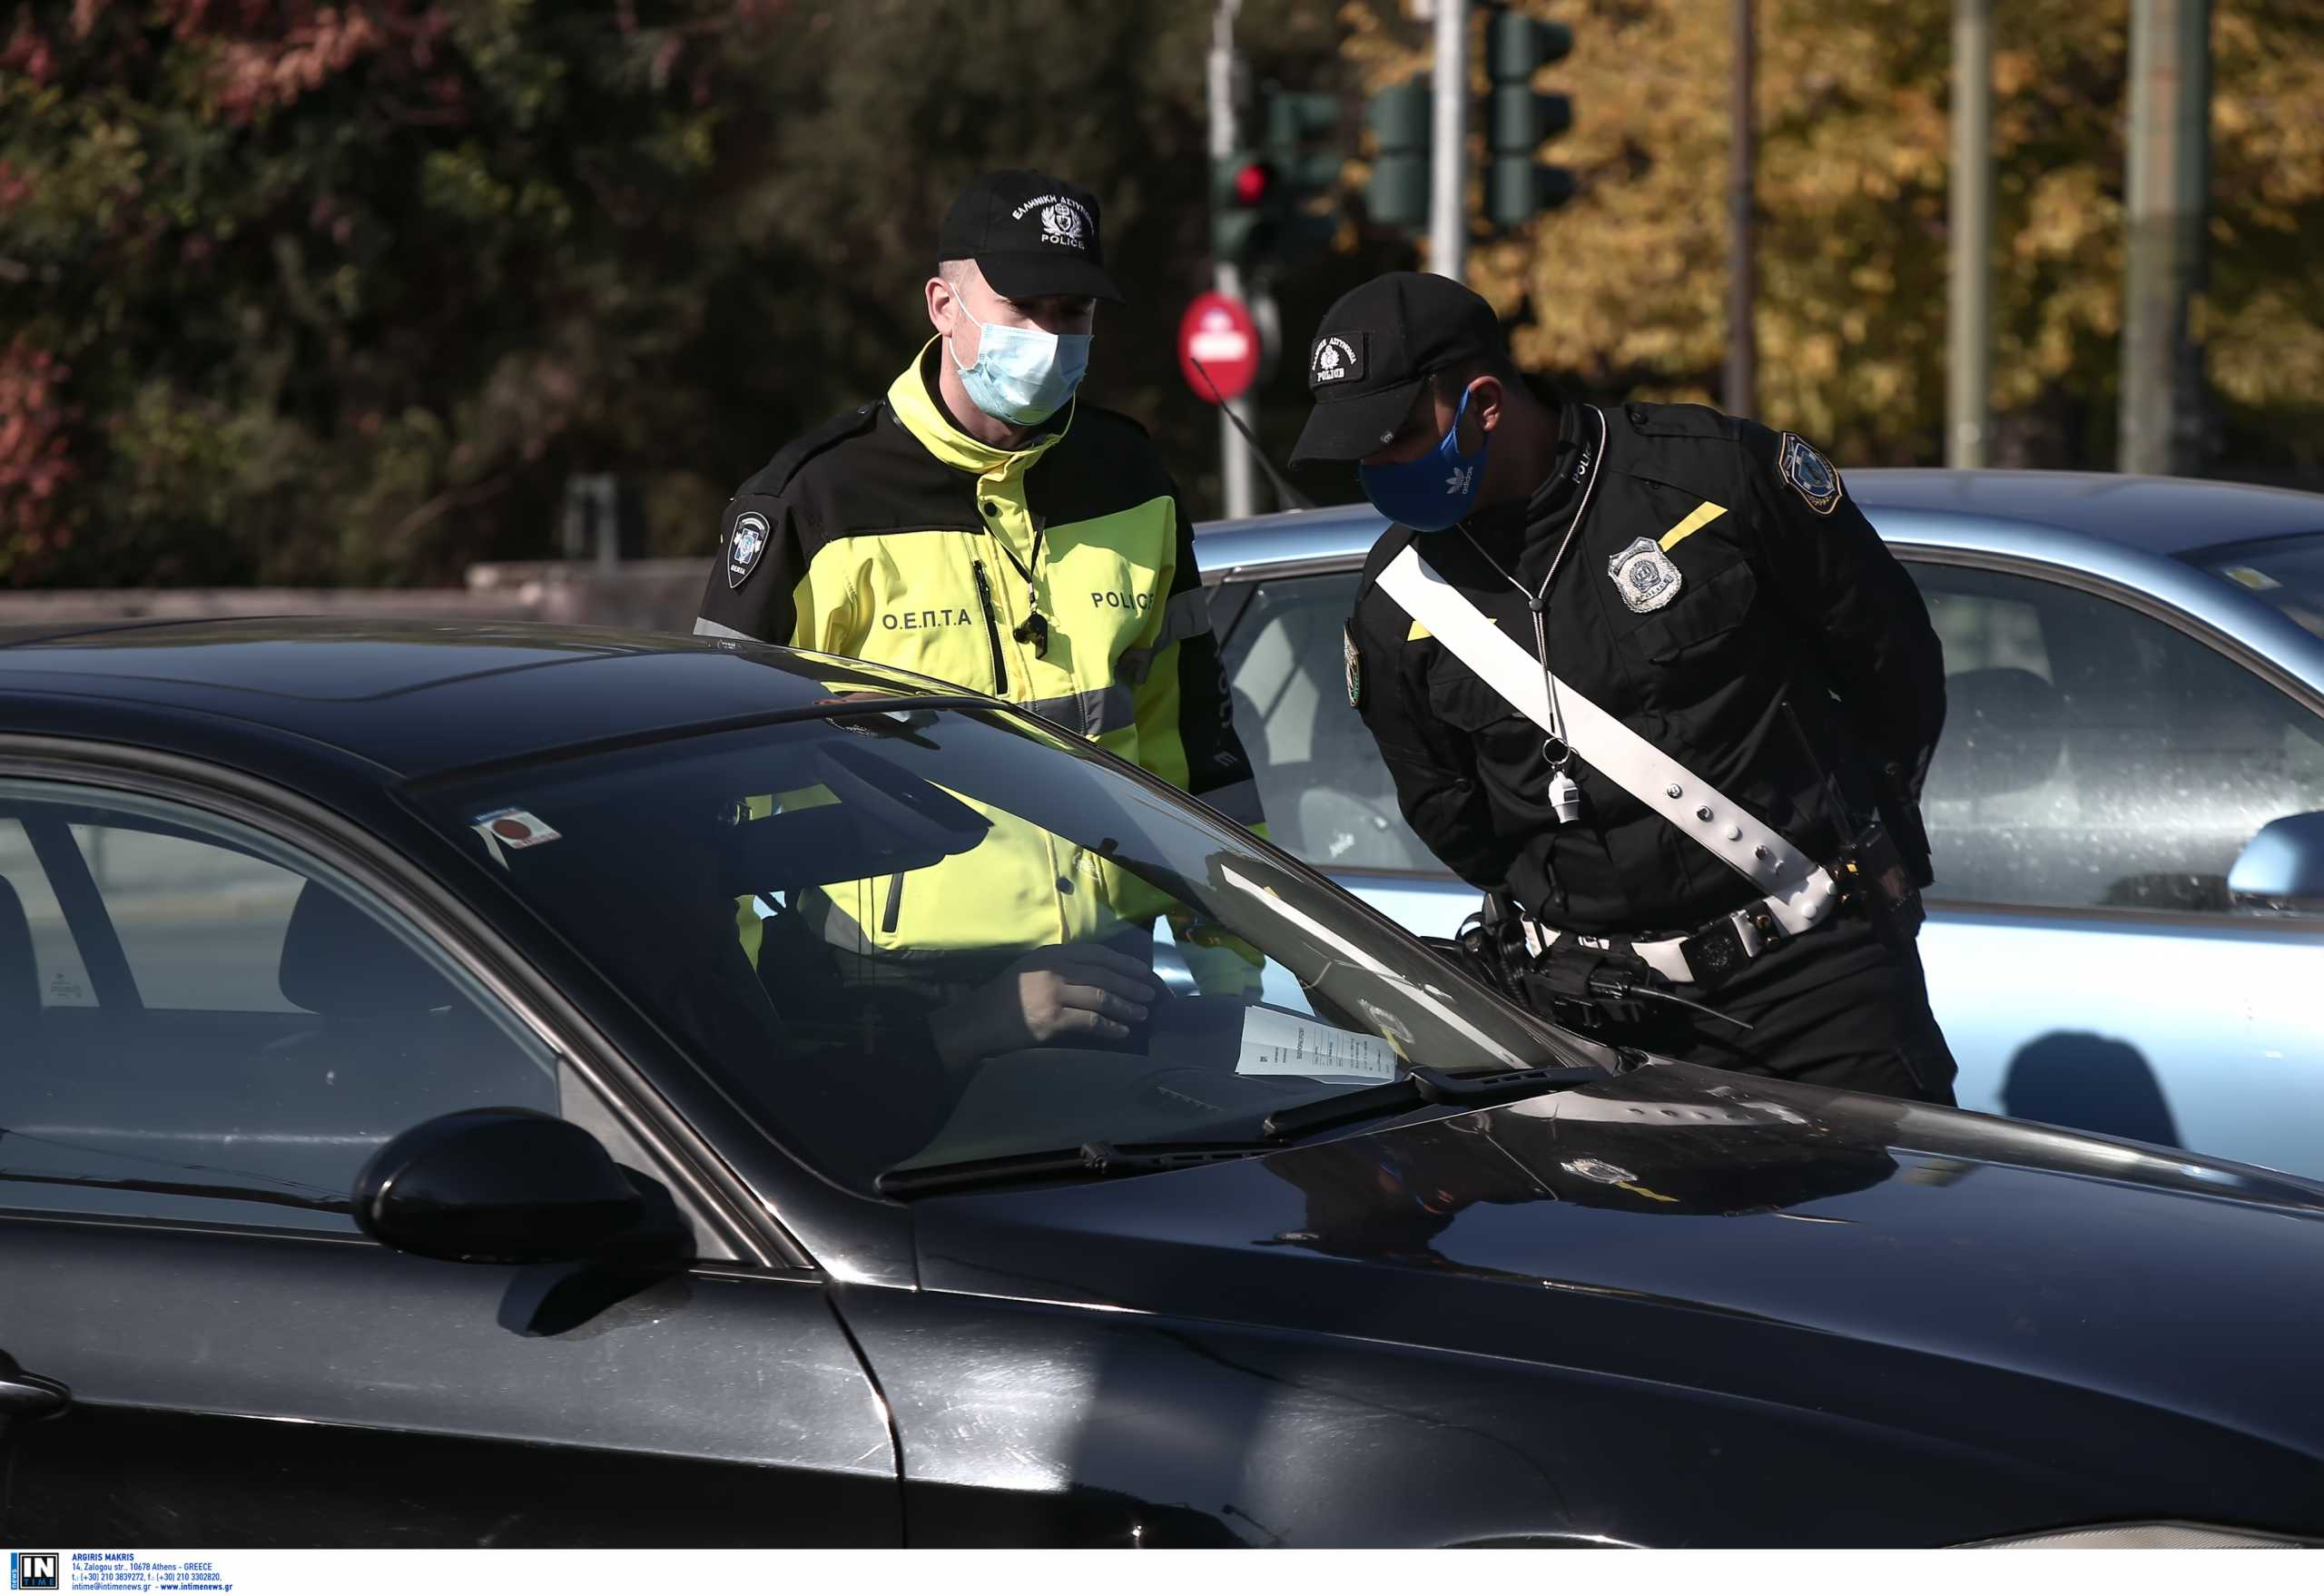 Lockdown: 40.000 ευρώ πρόστιμα και 6 συλλήψεις σε 24 ώρες – Στα «πράσα» πελάτες οίκου ανοχής